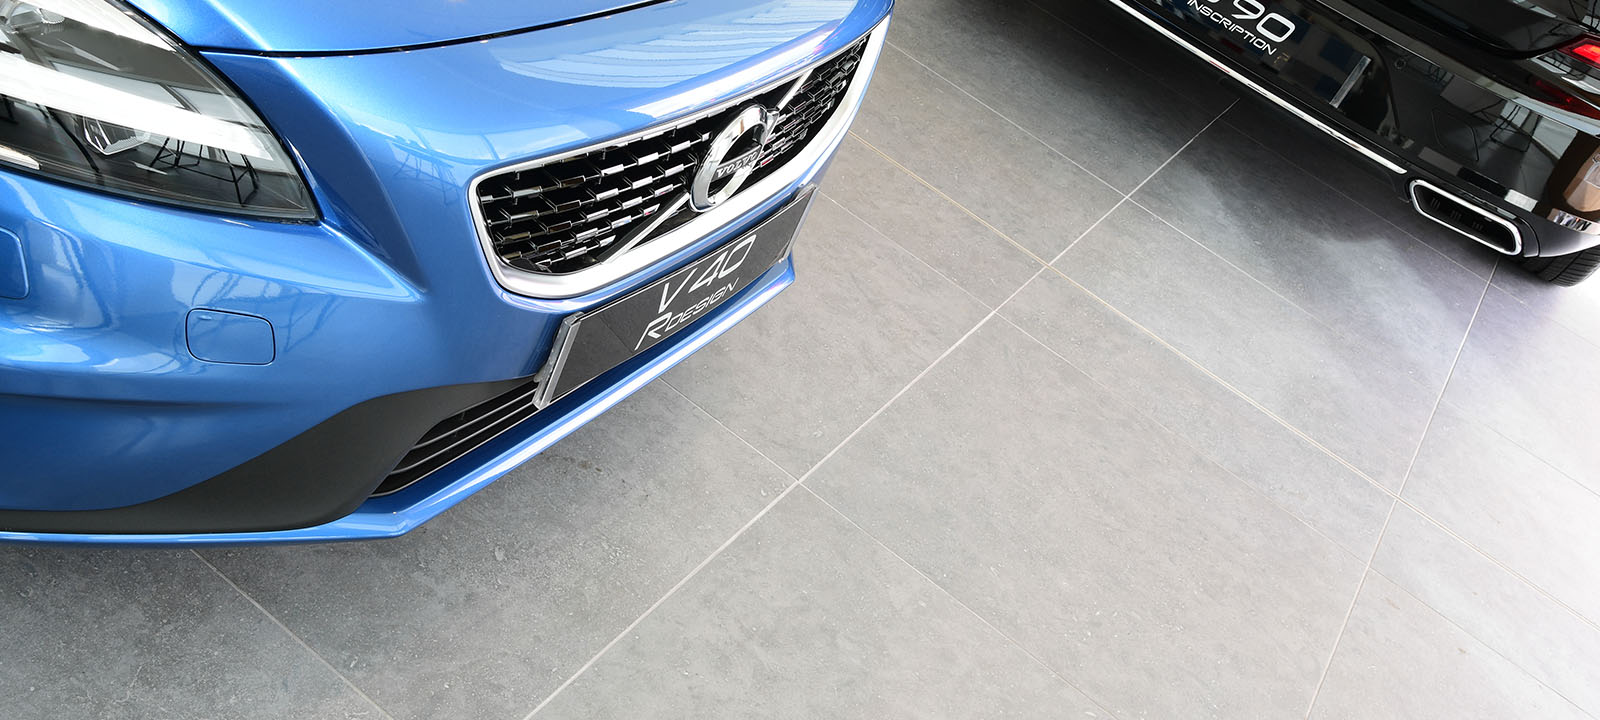 Volvo Showroom in Slough